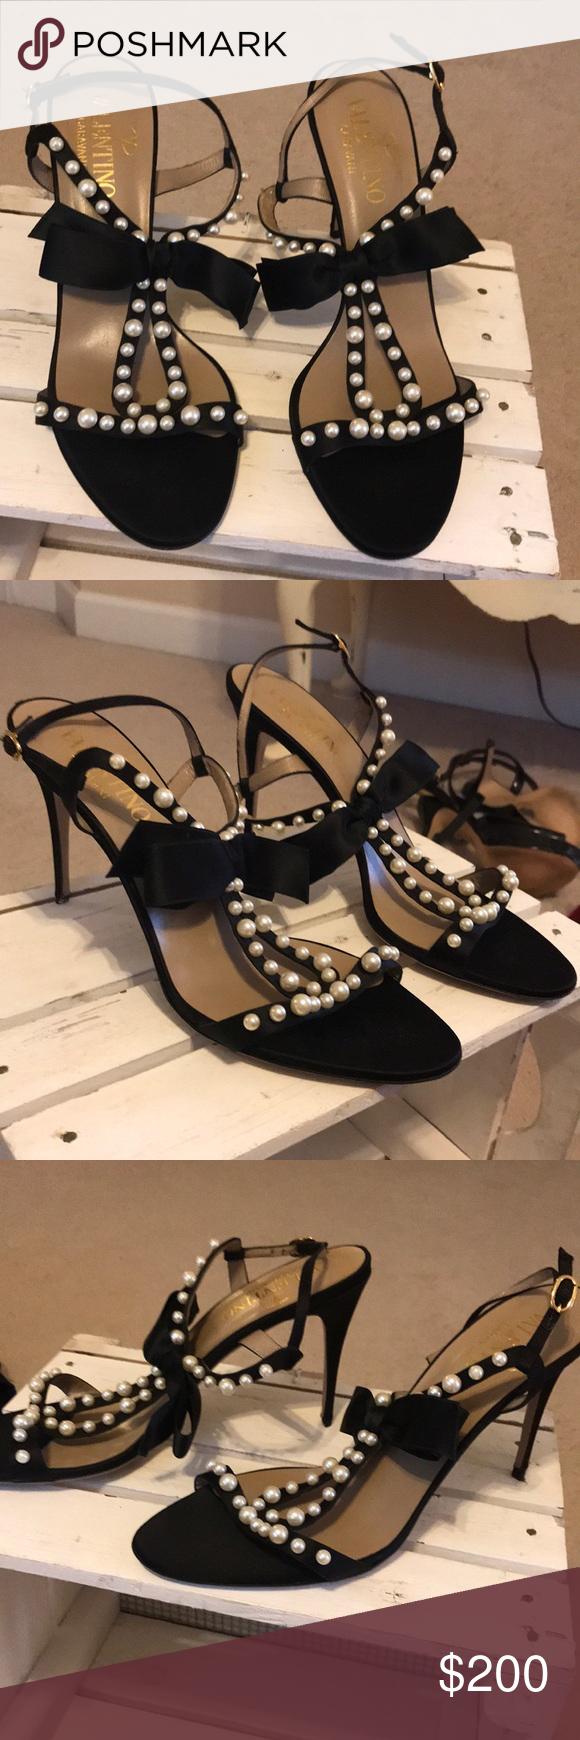 Valentino Garavani Pearl And Black Heels W Bow These Are